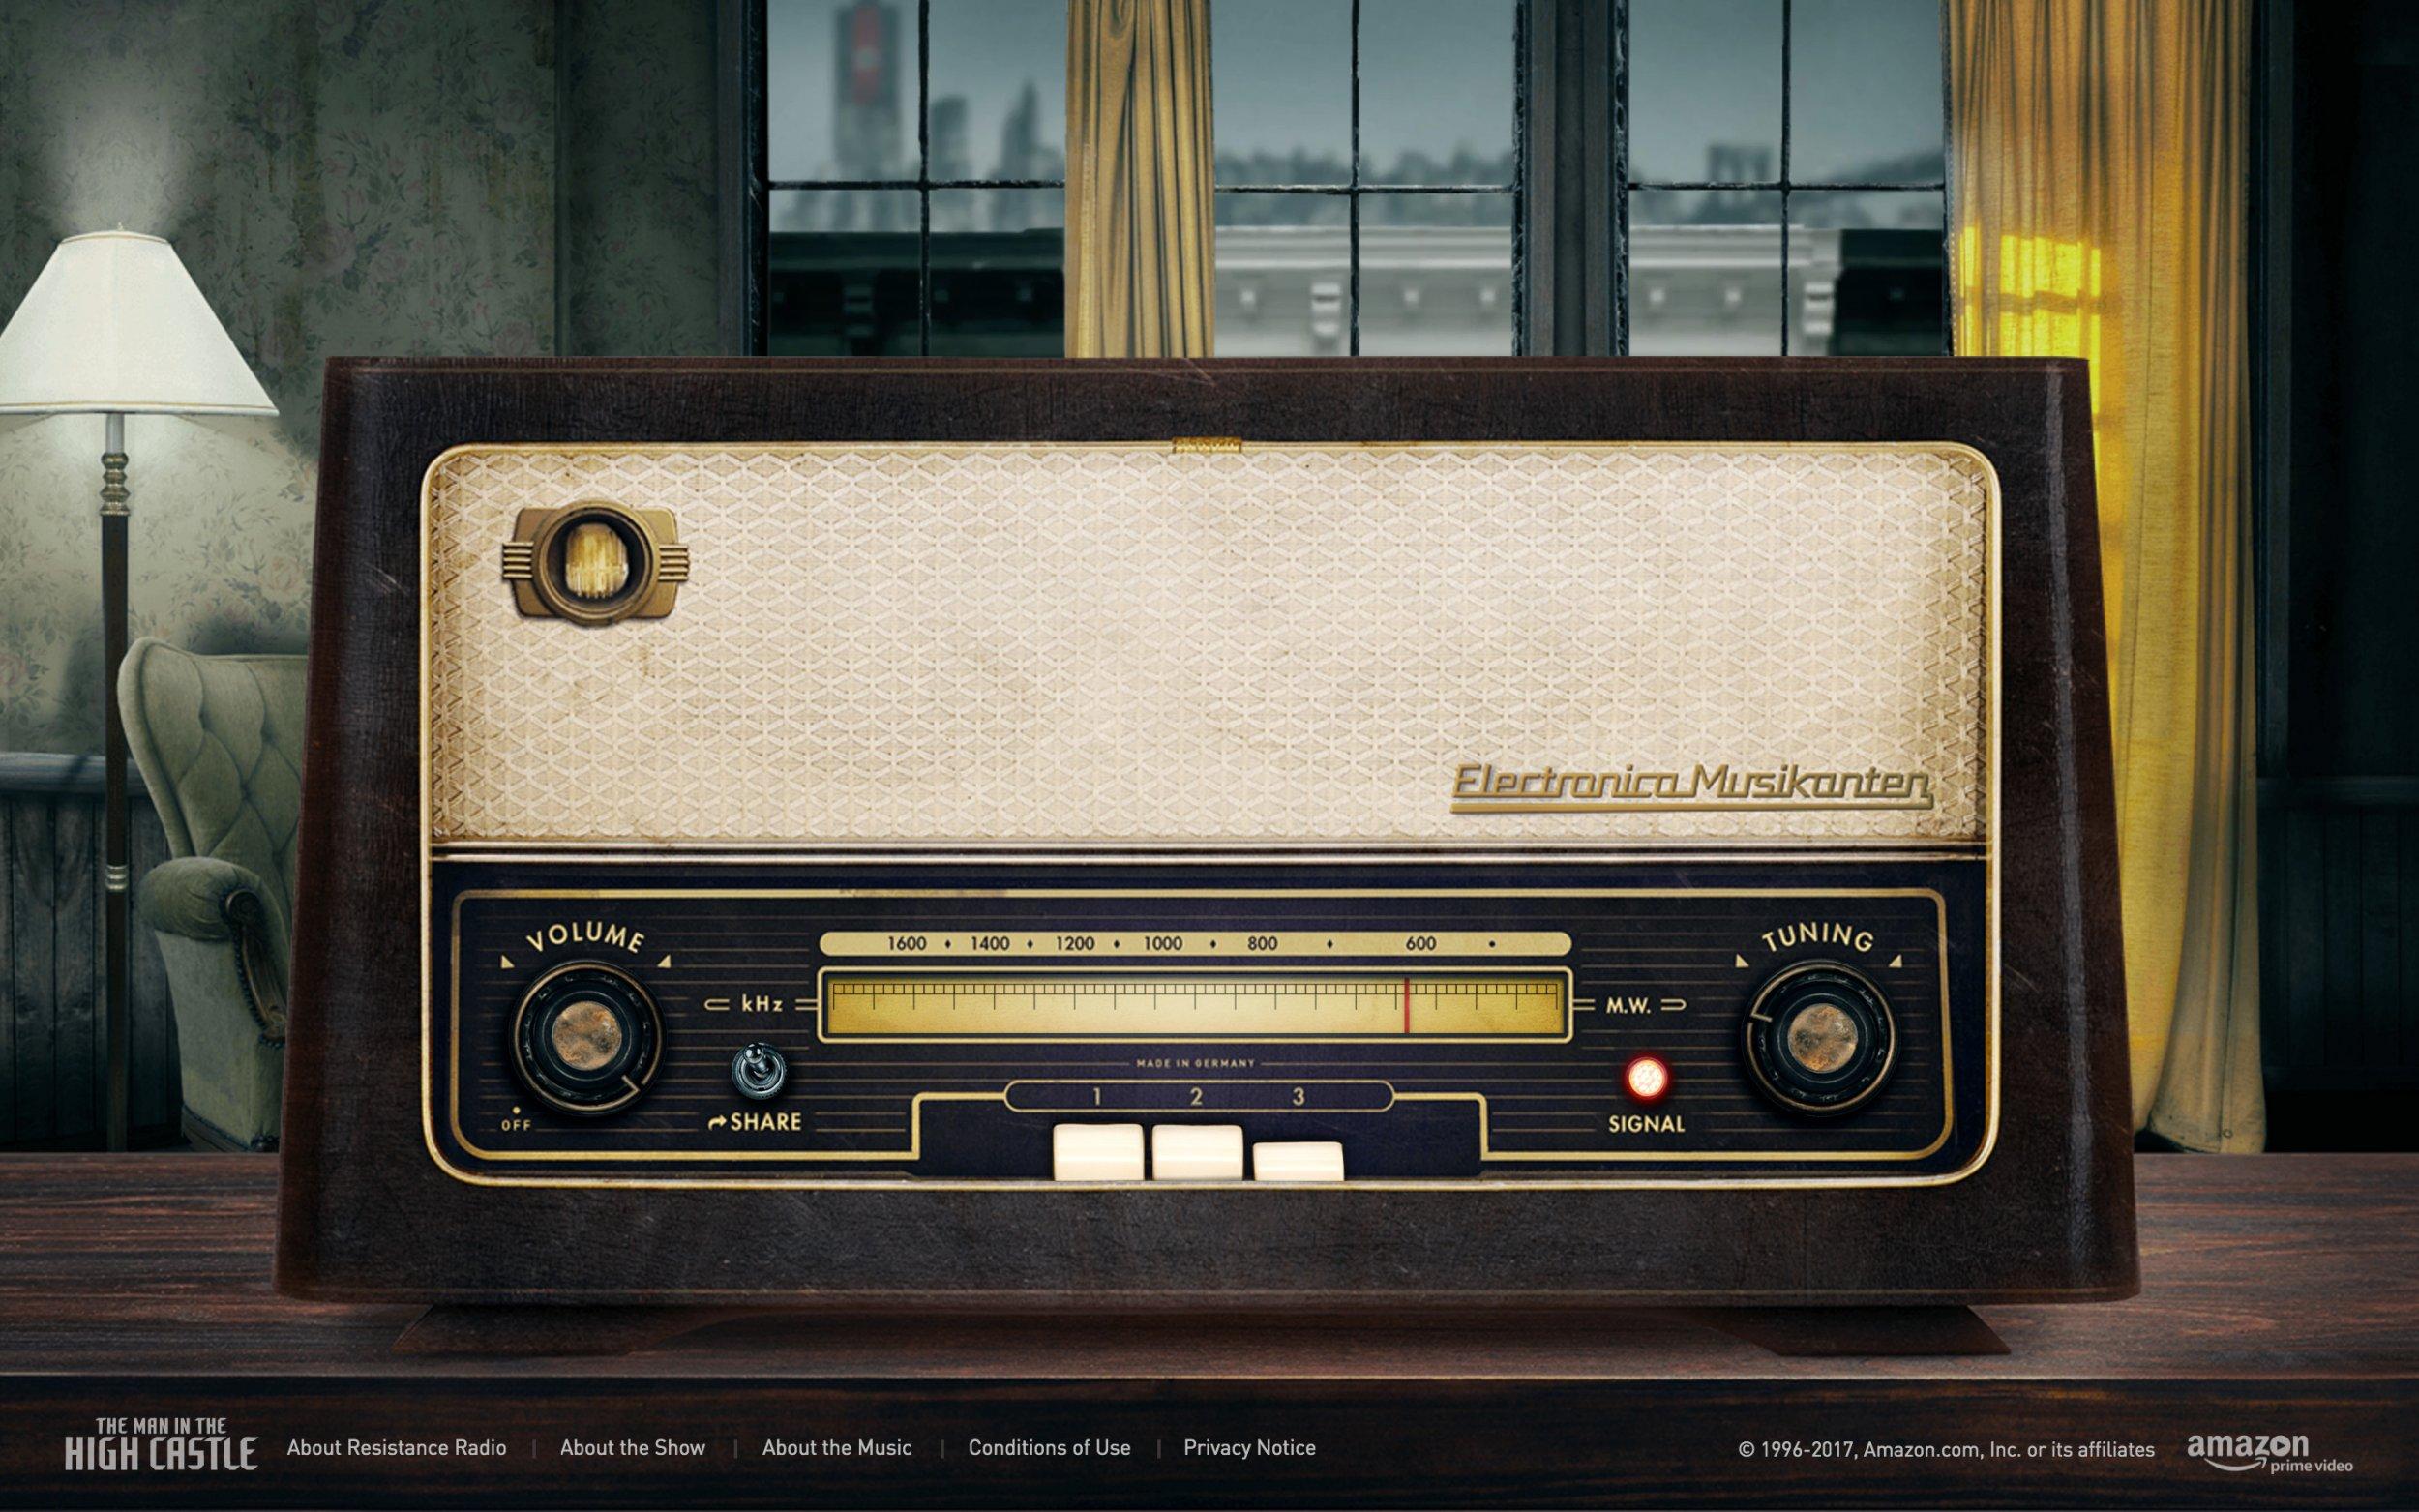 3-18-17 Resistance Radio